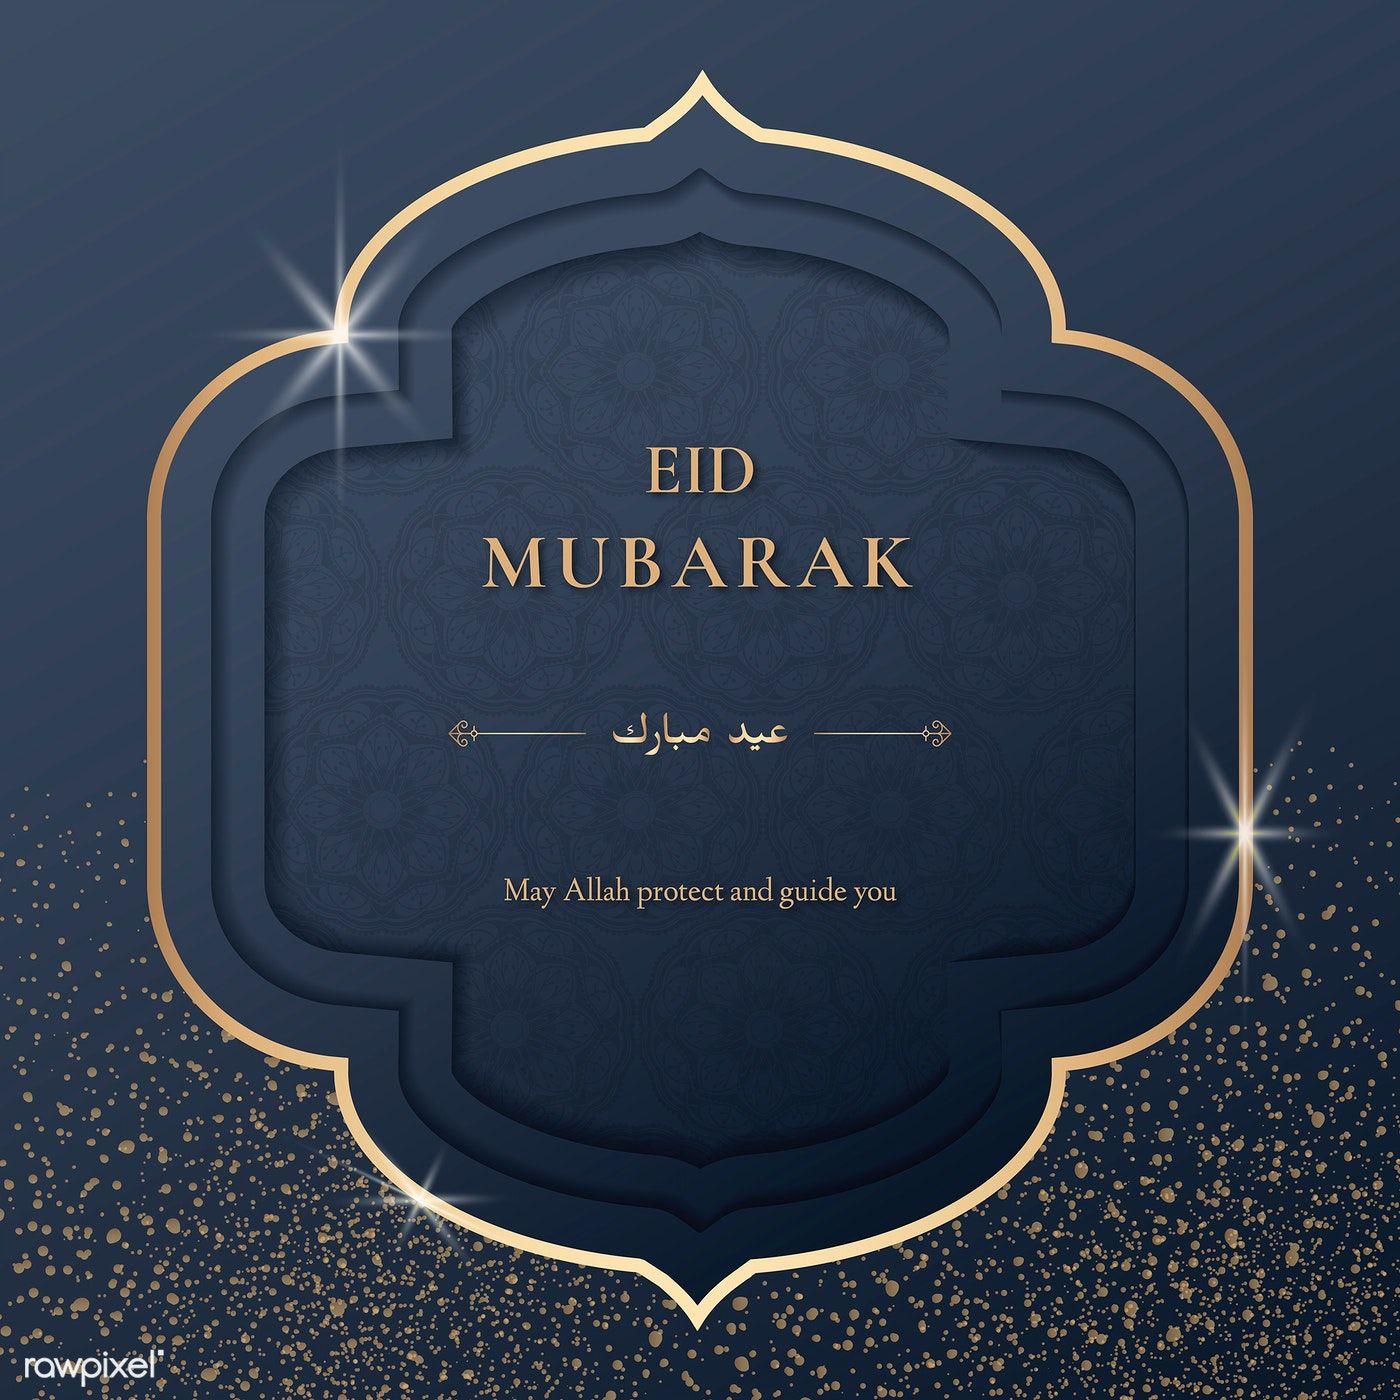 Festive Eid Mubarak Greeting Card Vector Free Image By Rawpixel